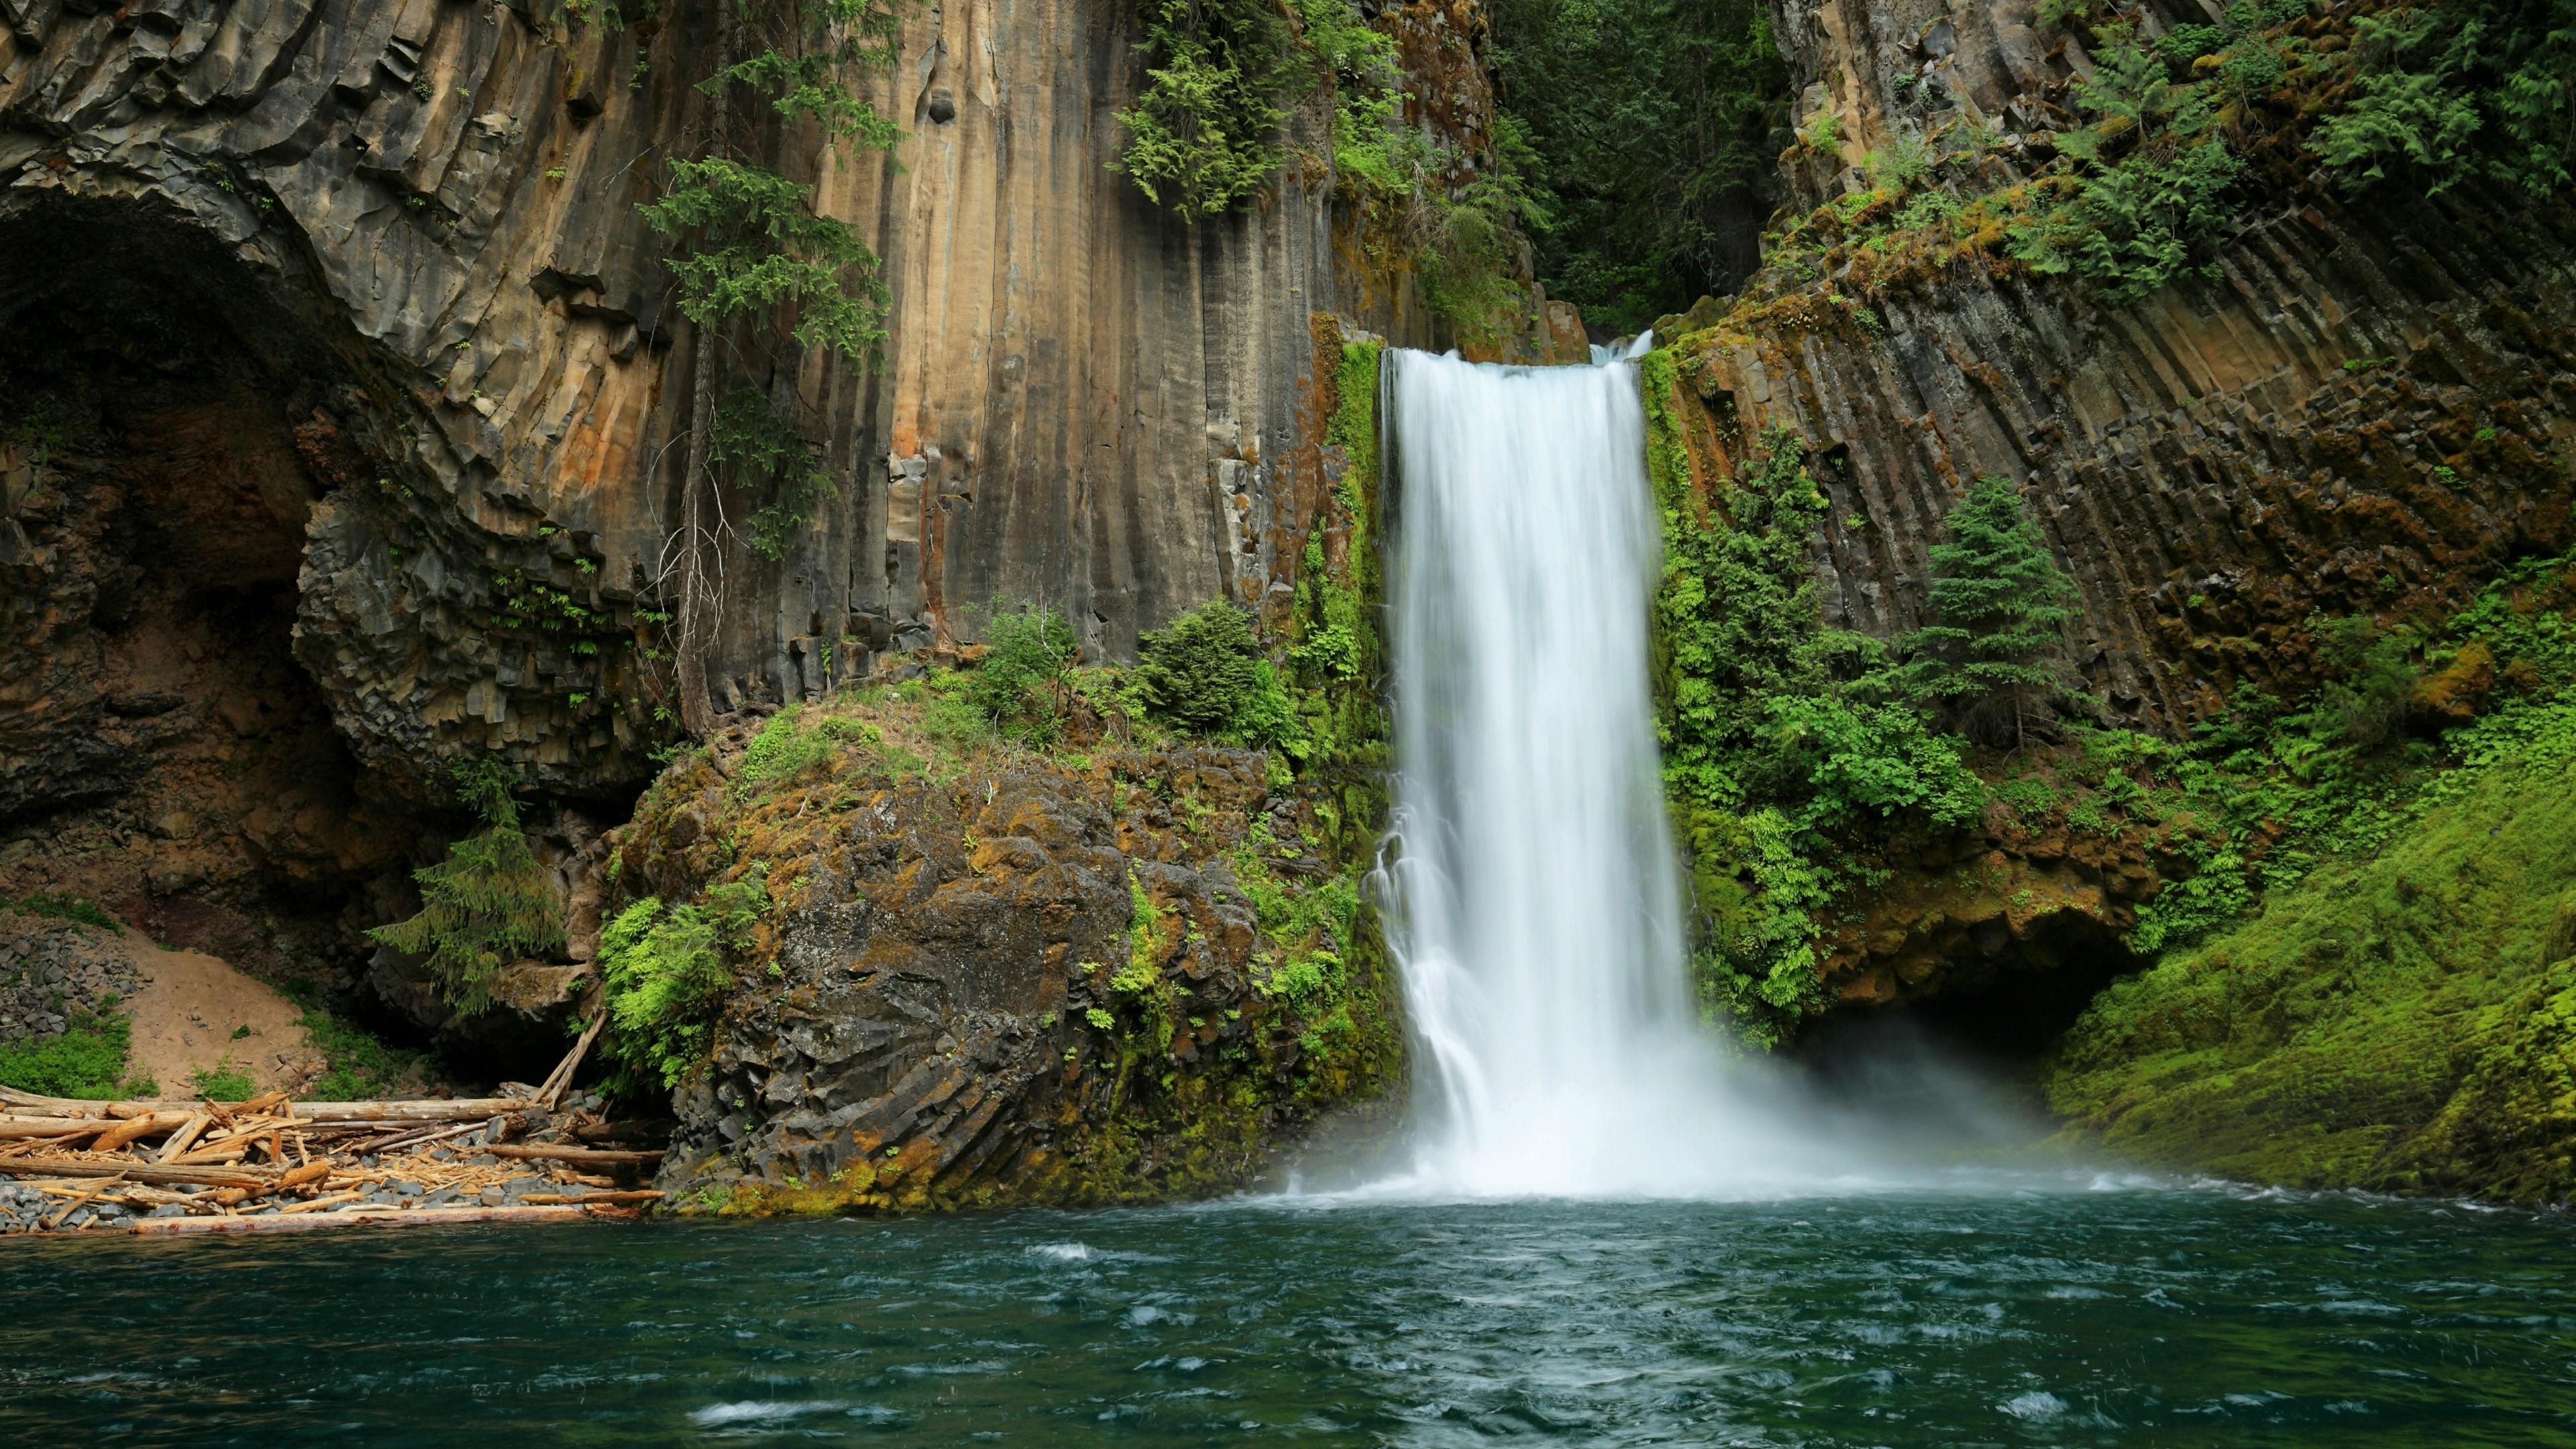 Toketee Falls on the North Umpqua River wallpaper